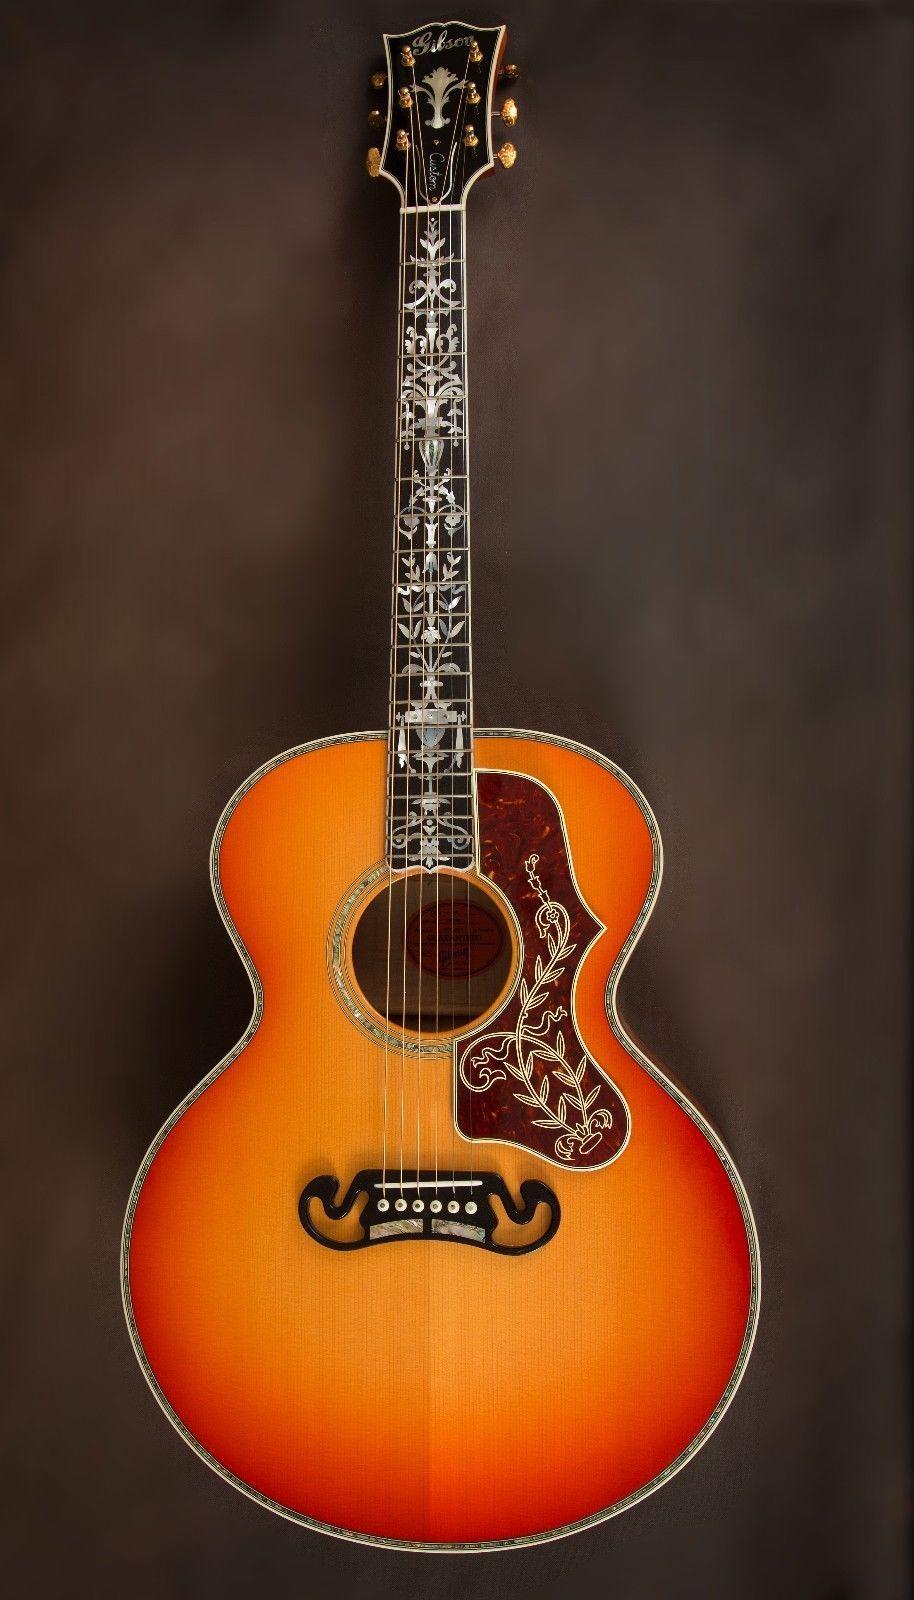 gibson j 185 custom vine acoustic guitar j 200 sj 200 gaga for gibsons acoustic guitar. Black Bedroom Furniture Sets. Home Design Ideas